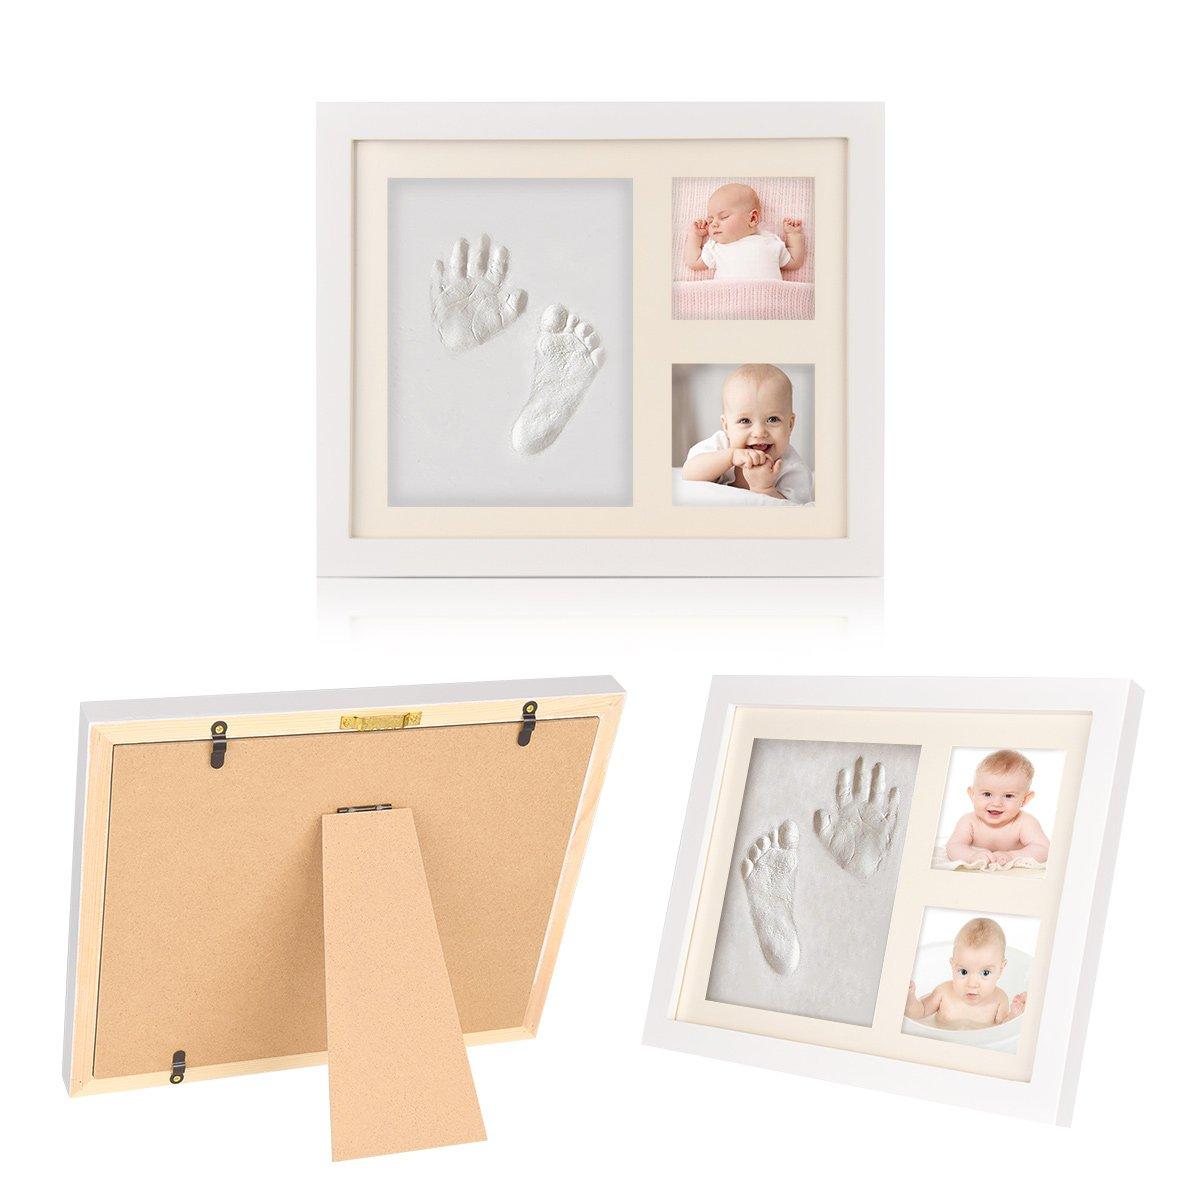 Baby Handprint and Footprint Photo Frame, Toddler Photo Album for Newborn Boys and Girls,Shower Gift Set with Nontoxic Clay Impression Nursery Decor Keepsake Frame(1 Pack) BingoKid